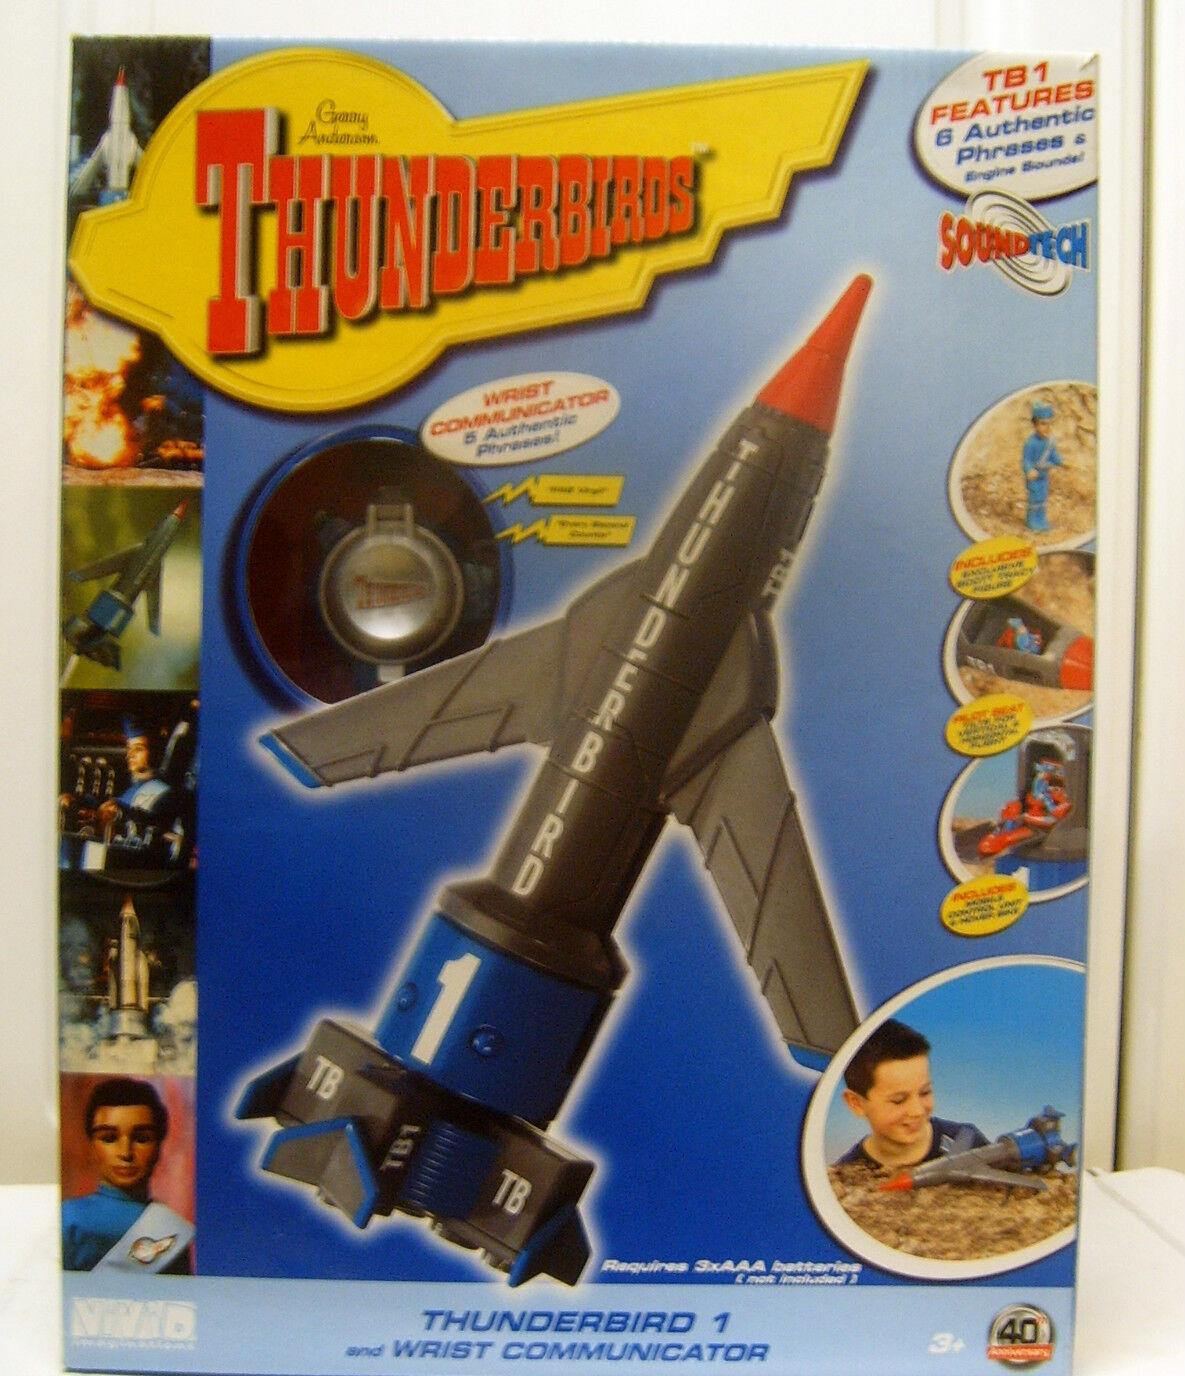 5 4 3 2 1 RARE SPECIAL 40TH ANNIVERSARY SUPERGröße THUNDERBIRD 1 + COMMUNICATOR